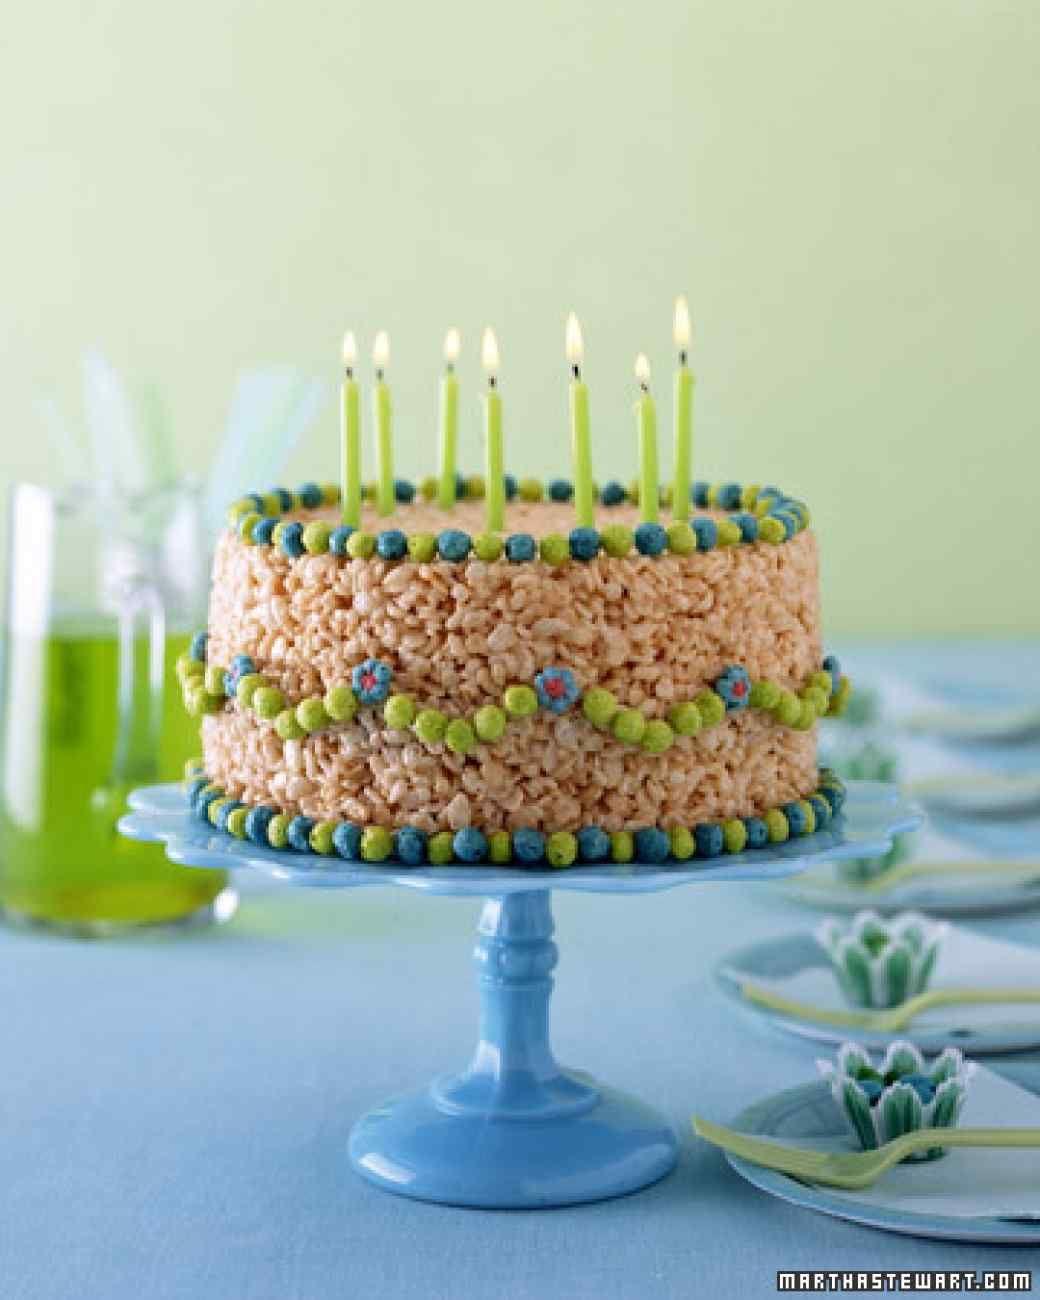 Astonishing No Bake Birthday Cake Recipe Birthday Cake Kids Rice Crispy Personalised Birthday Cards Sponlily Jamesorg